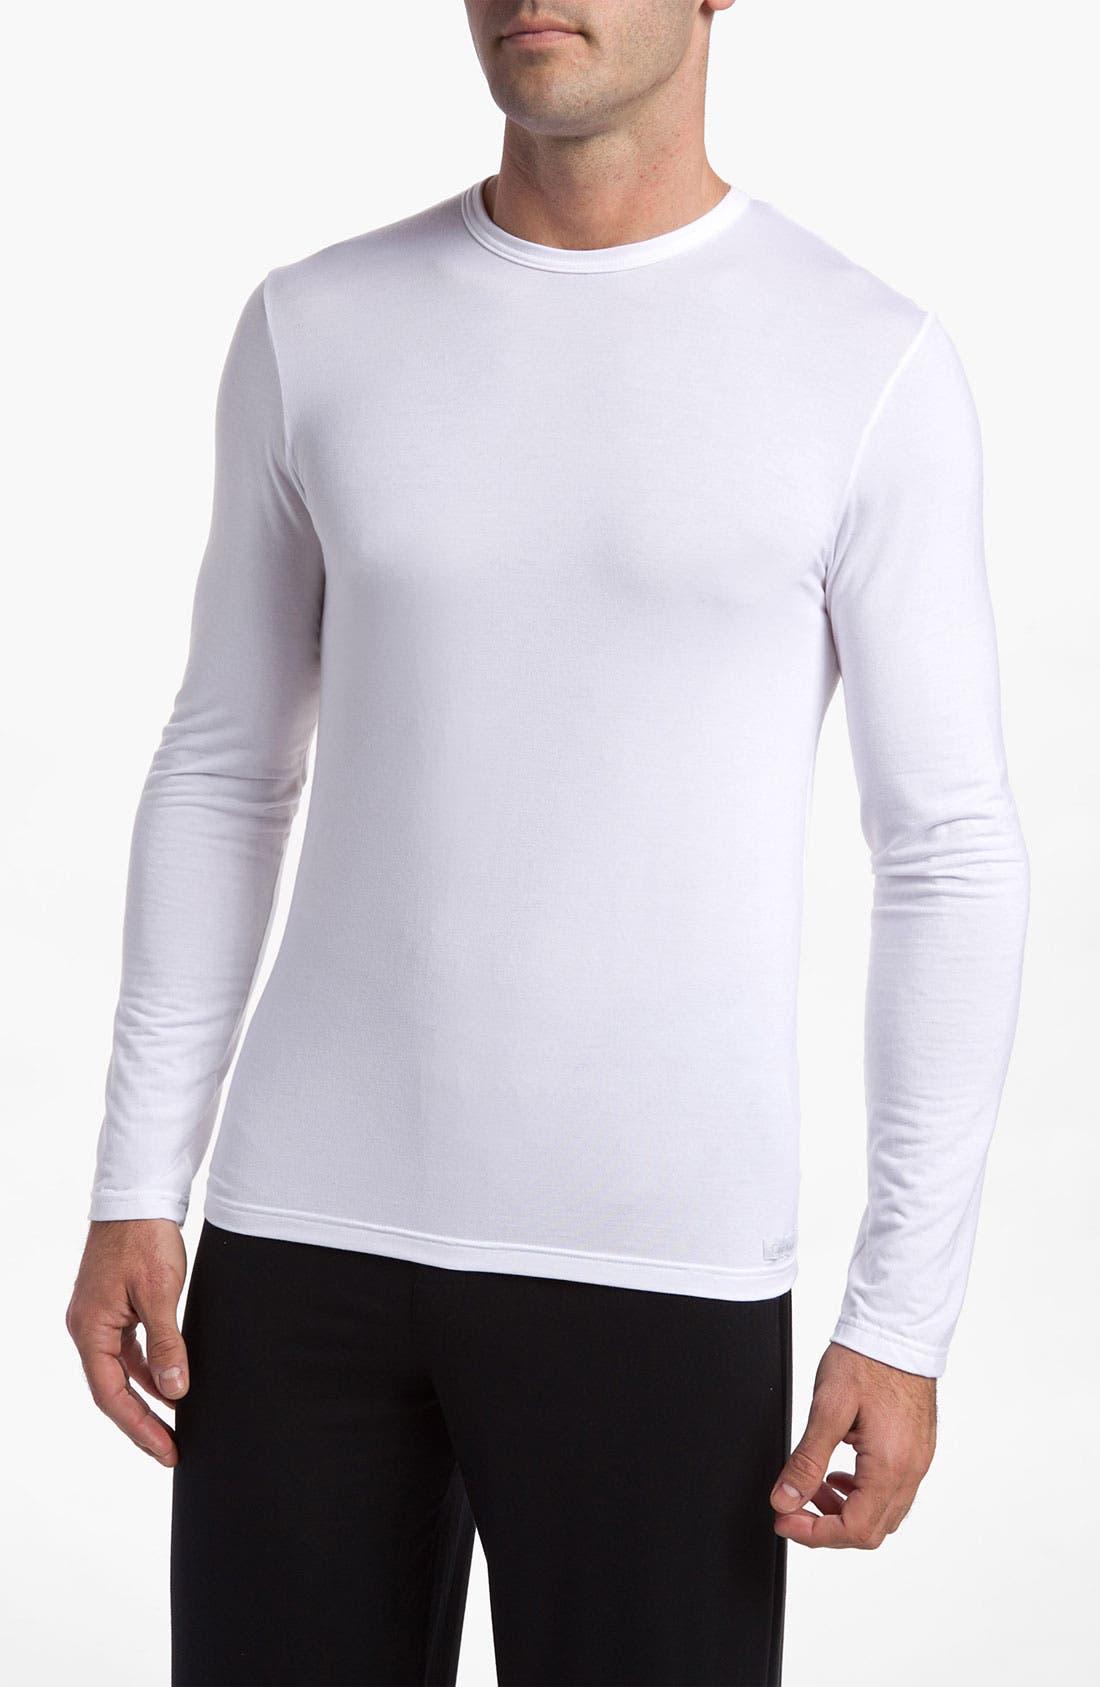 Main Image - Calvin Klein 'U1139' Micromodal Long Sleeve T-Shirt